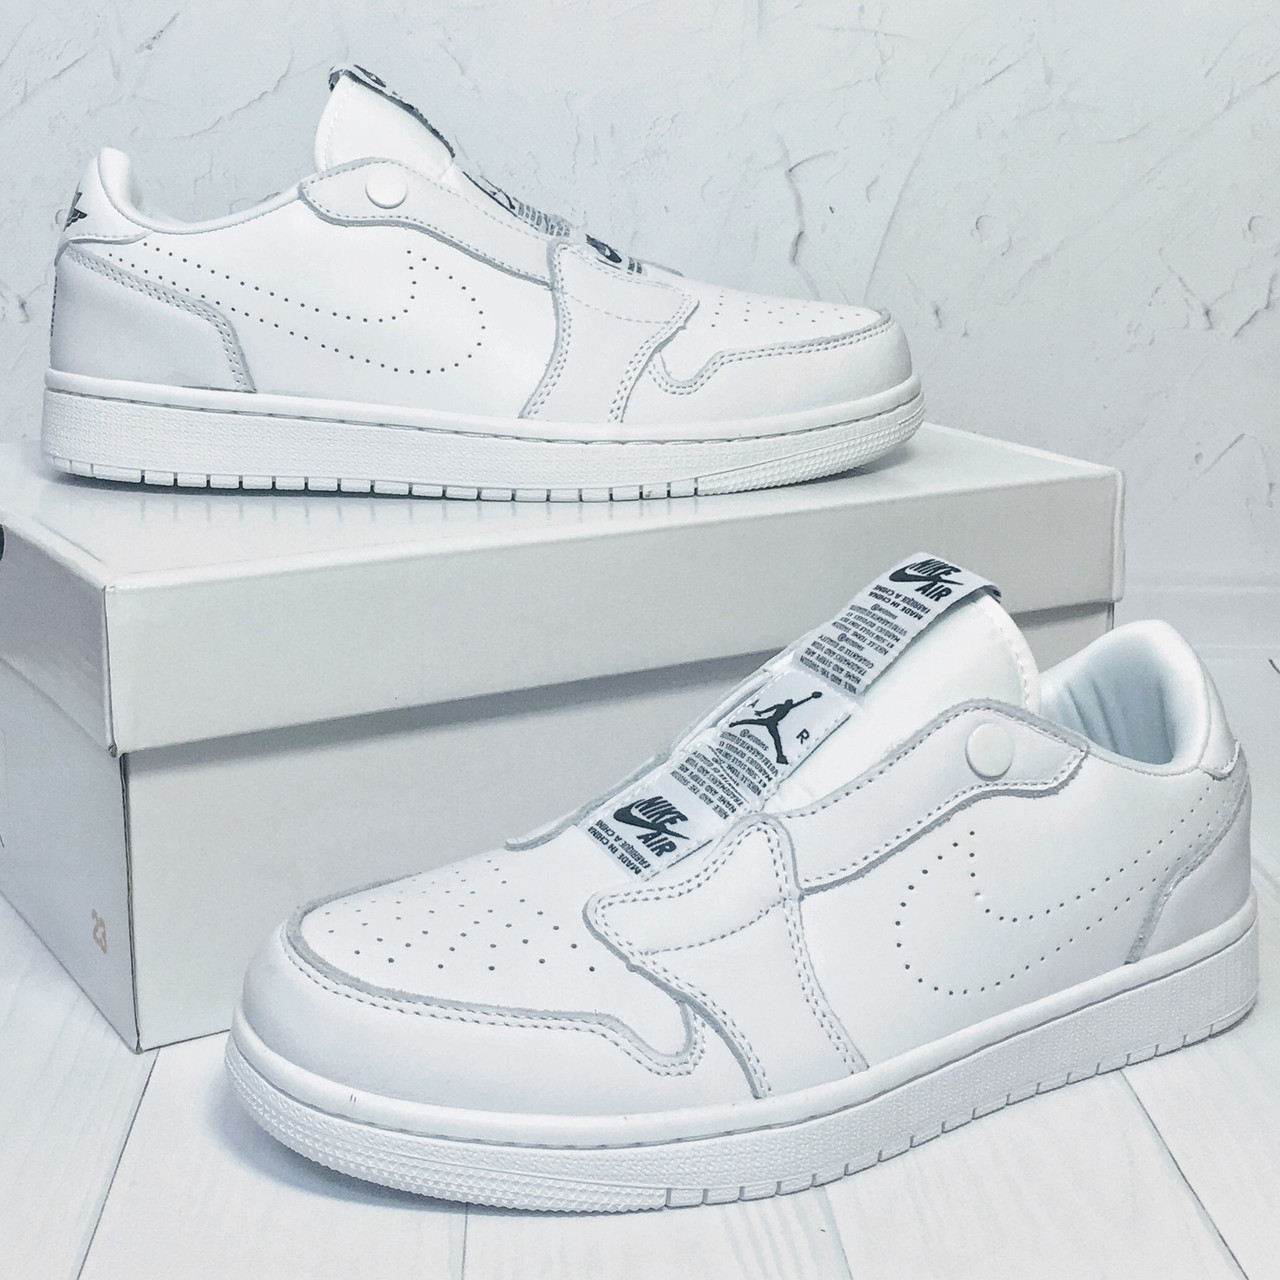 Кроссовки мужские Nike Air Jordan 1 Retro Low Slip белые (Top replic)